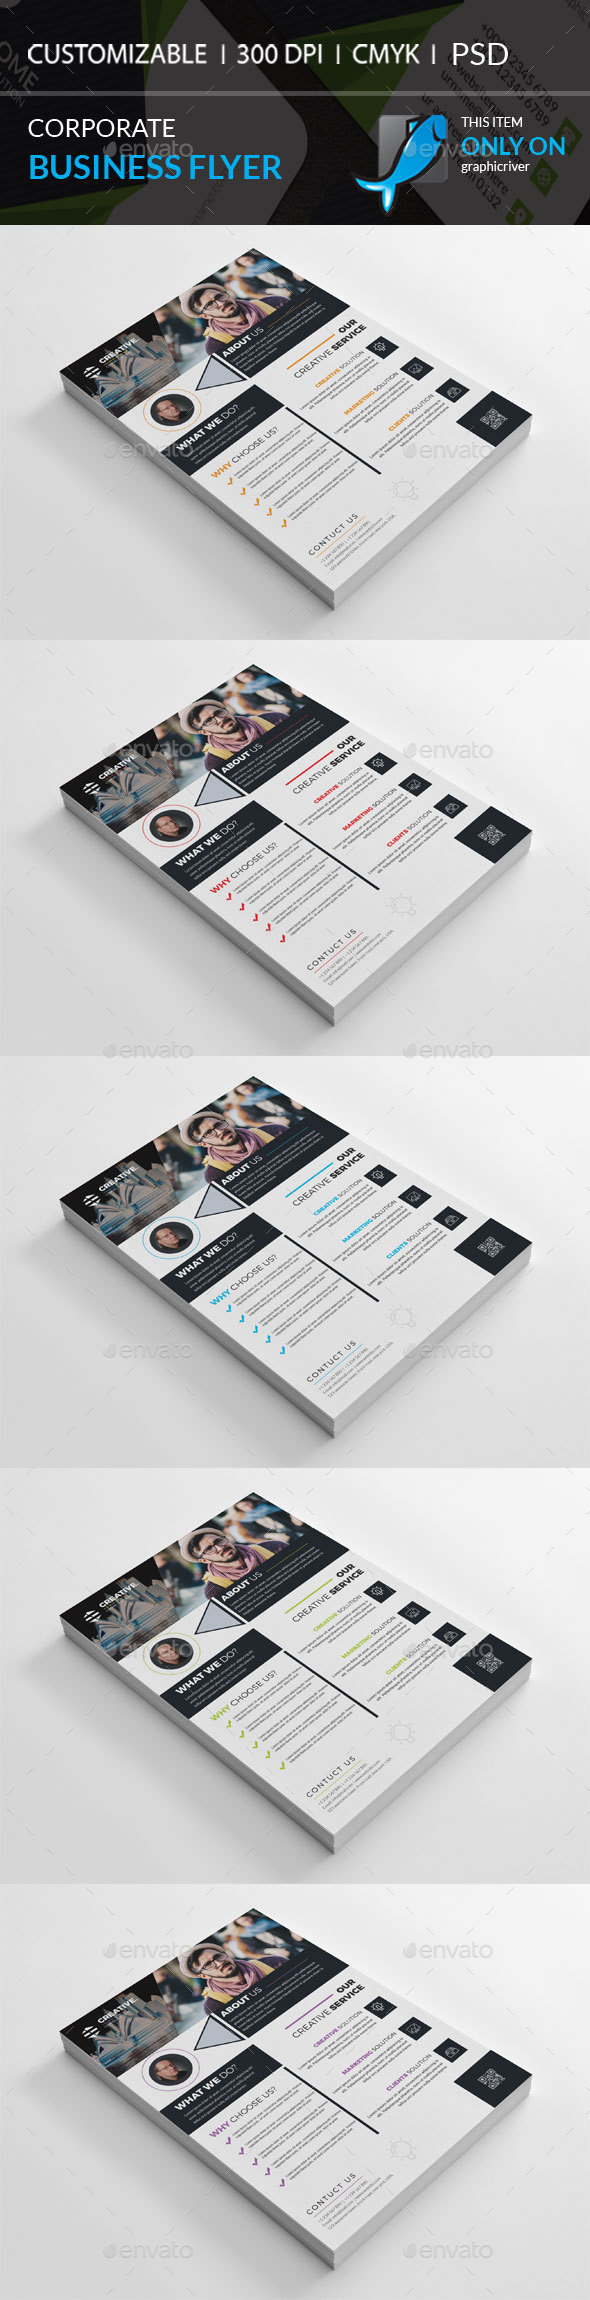 GraphicRiver Corporate Flyer 20774467